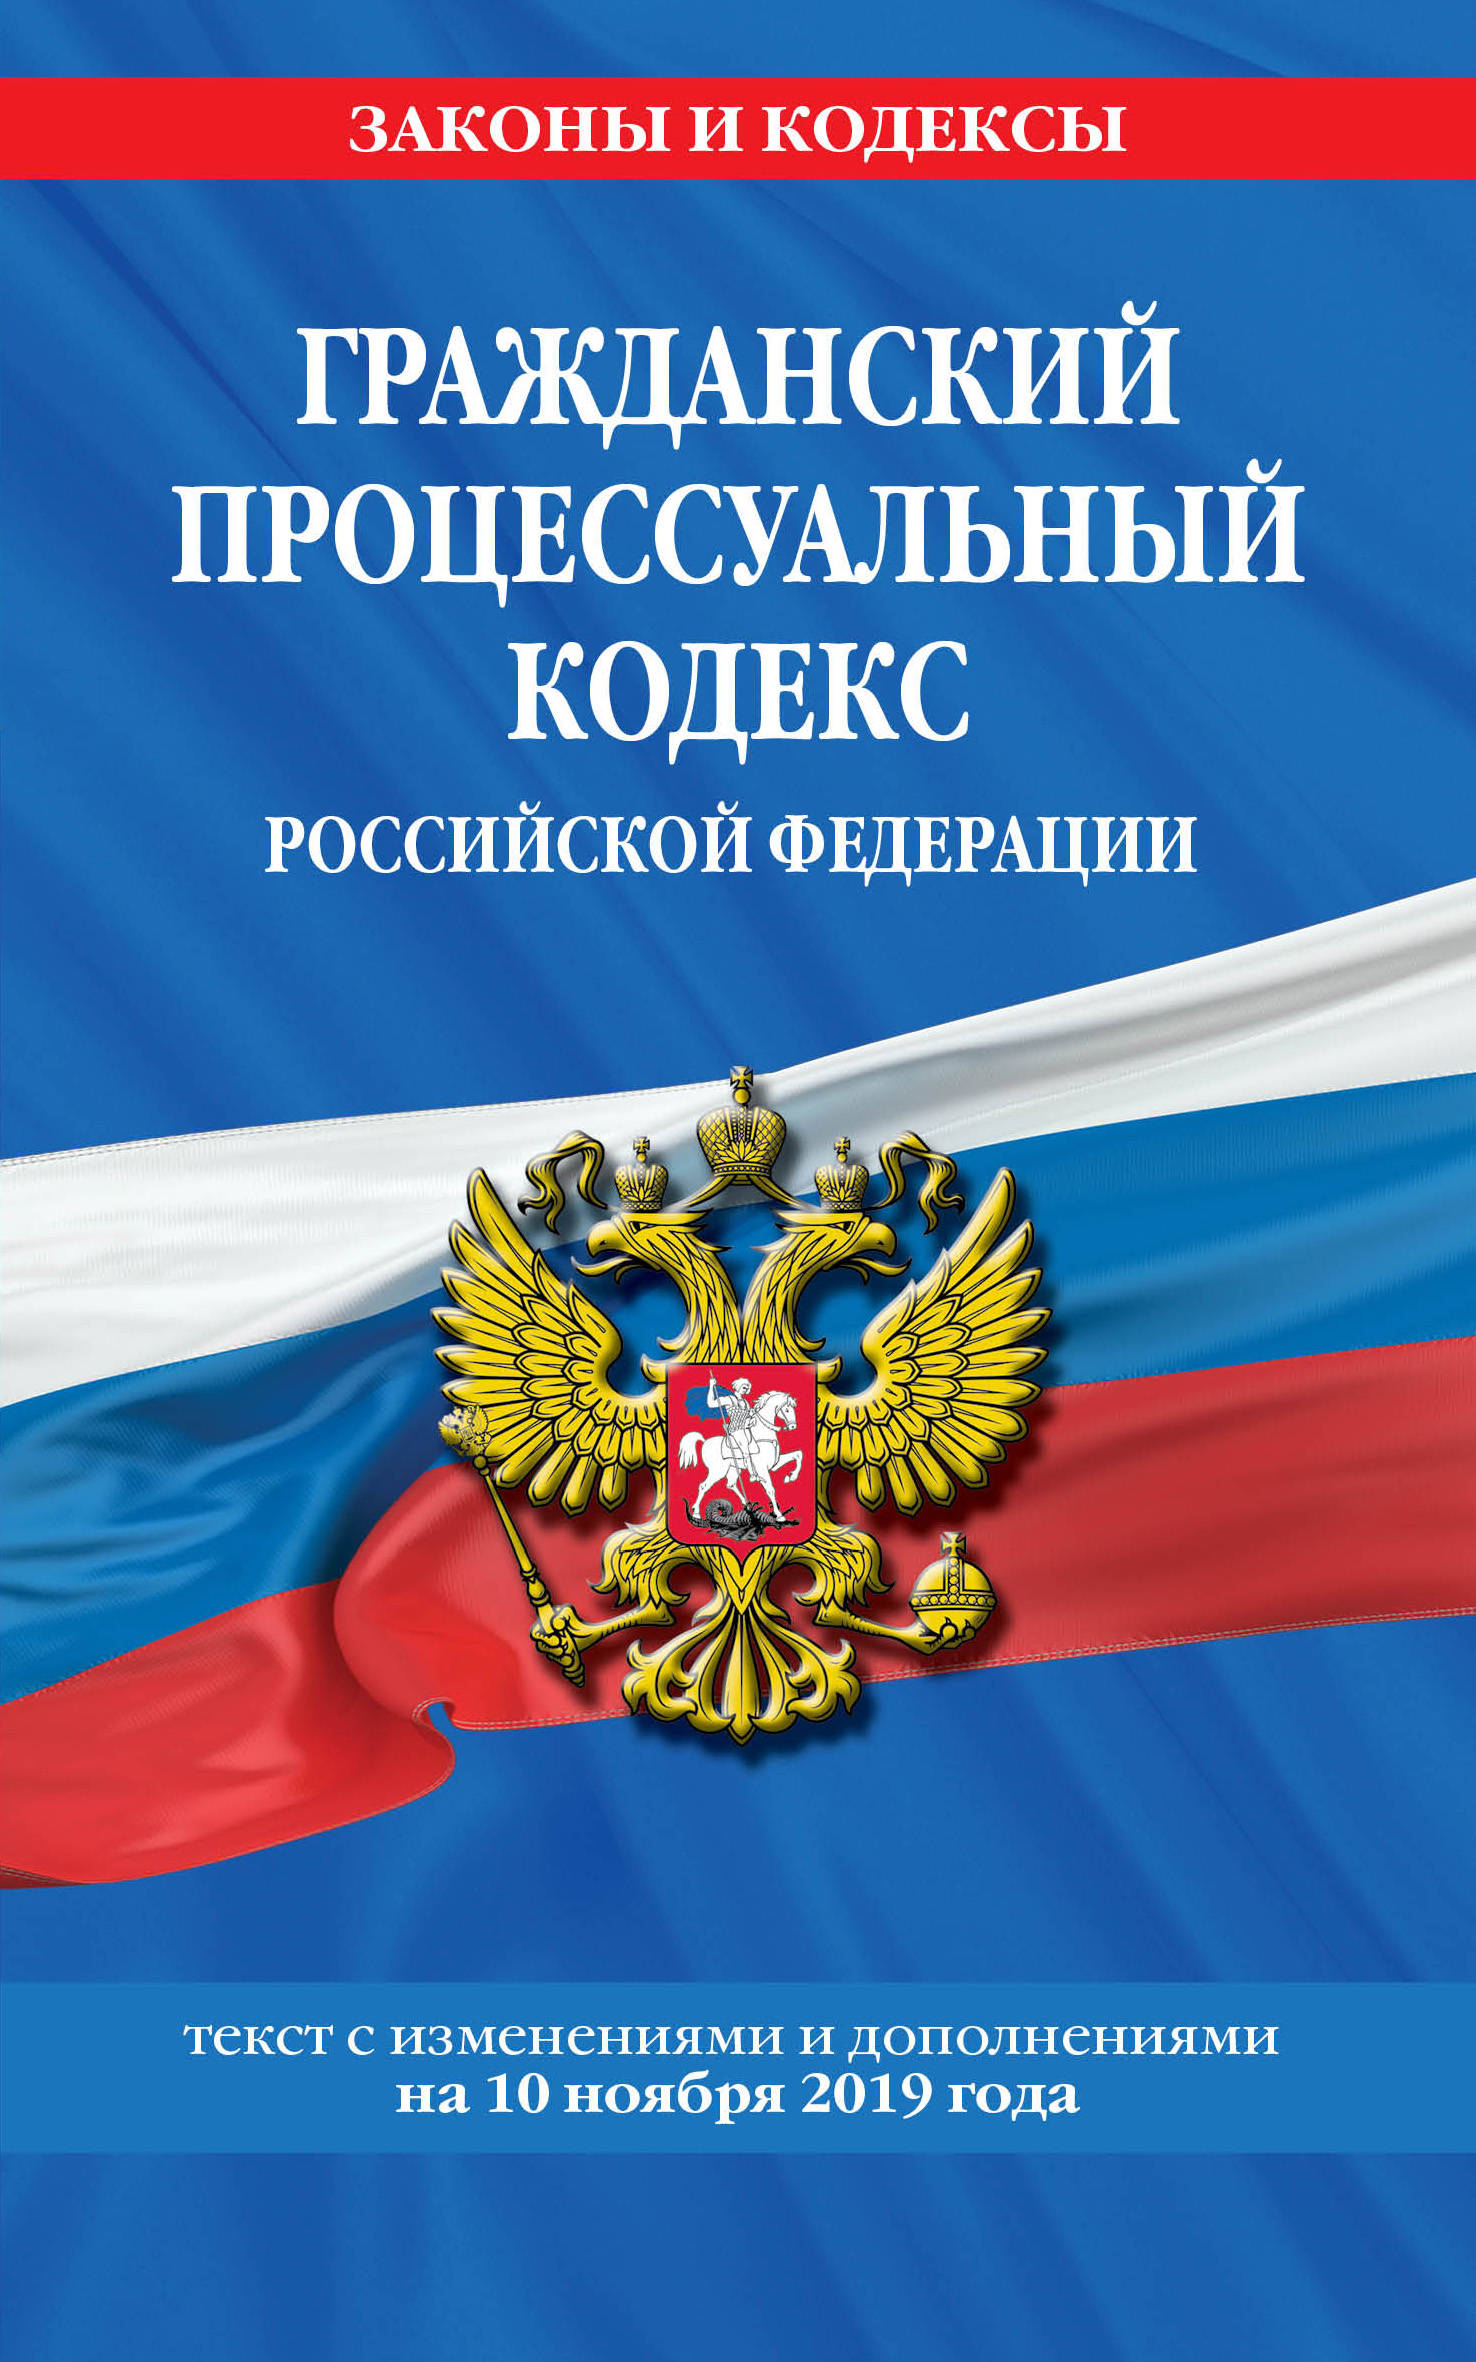 Grazhdanskij protsessualnyj kodeks Rossijskoj Federatsii: tekst s izmenenijami i dopolnenijami na 10 nojabrja 2019 g.